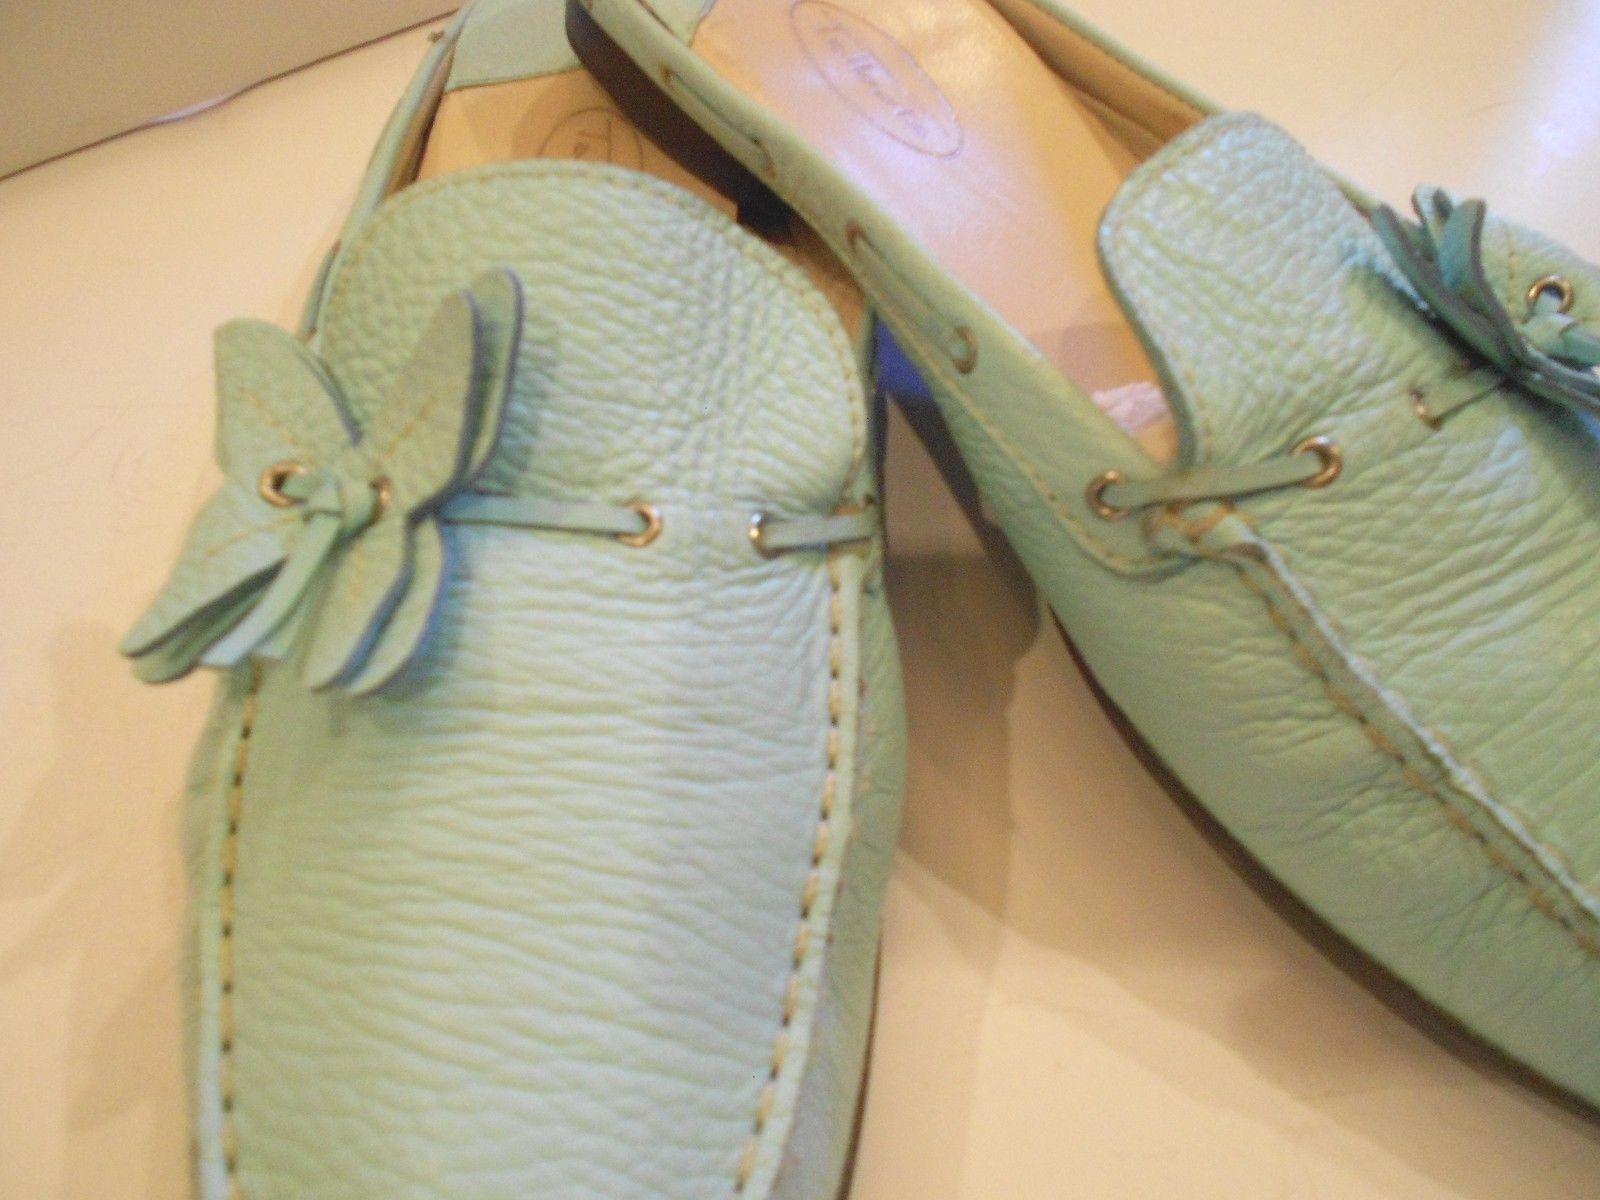 CUTE TALBOTS LEATHER SLIP ON FLATS BLUE/GREEN 11B MED RETAIL $120